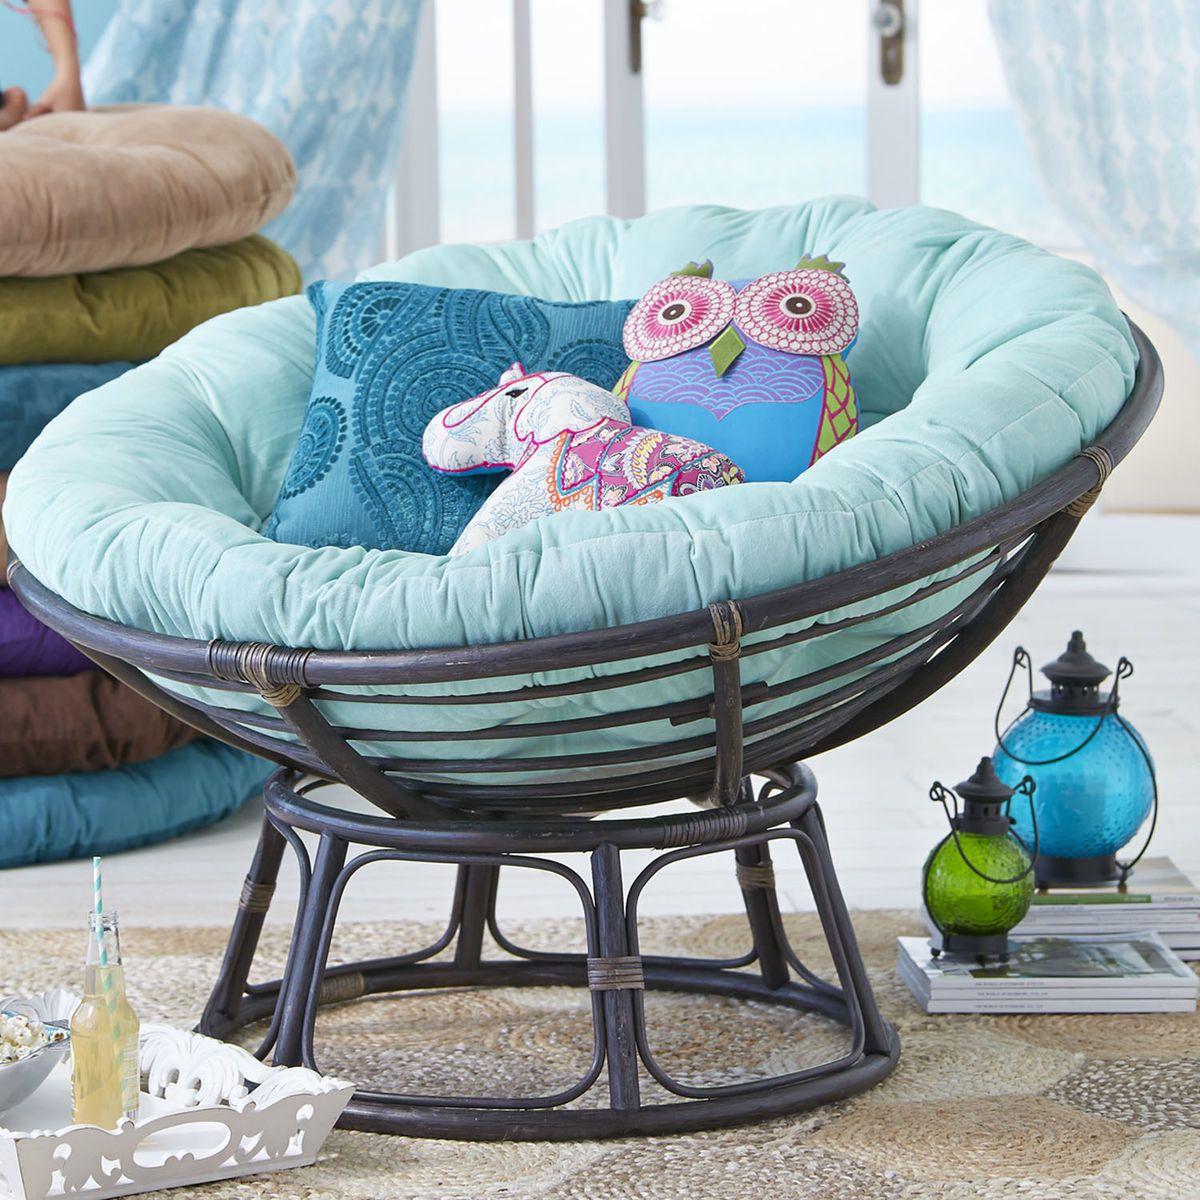 papasan cushion plush mint green pier 1 imports no place like home pinterest papasan. Black Bedroom Furniture Sets. Home Design Ideas